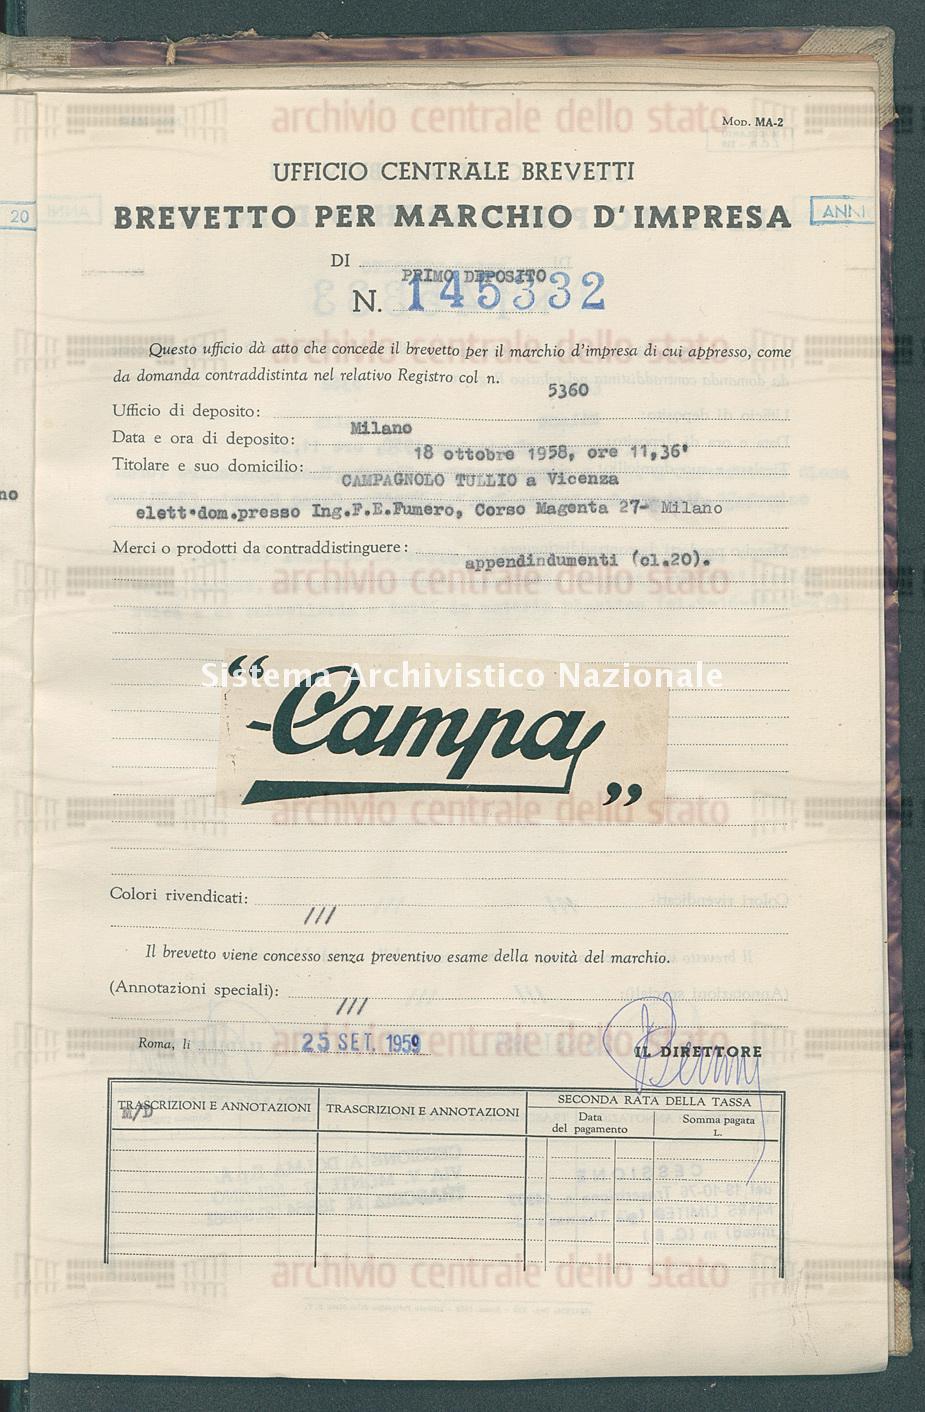 Appendindumenti Campagnolo Tullio (25/09/1959)